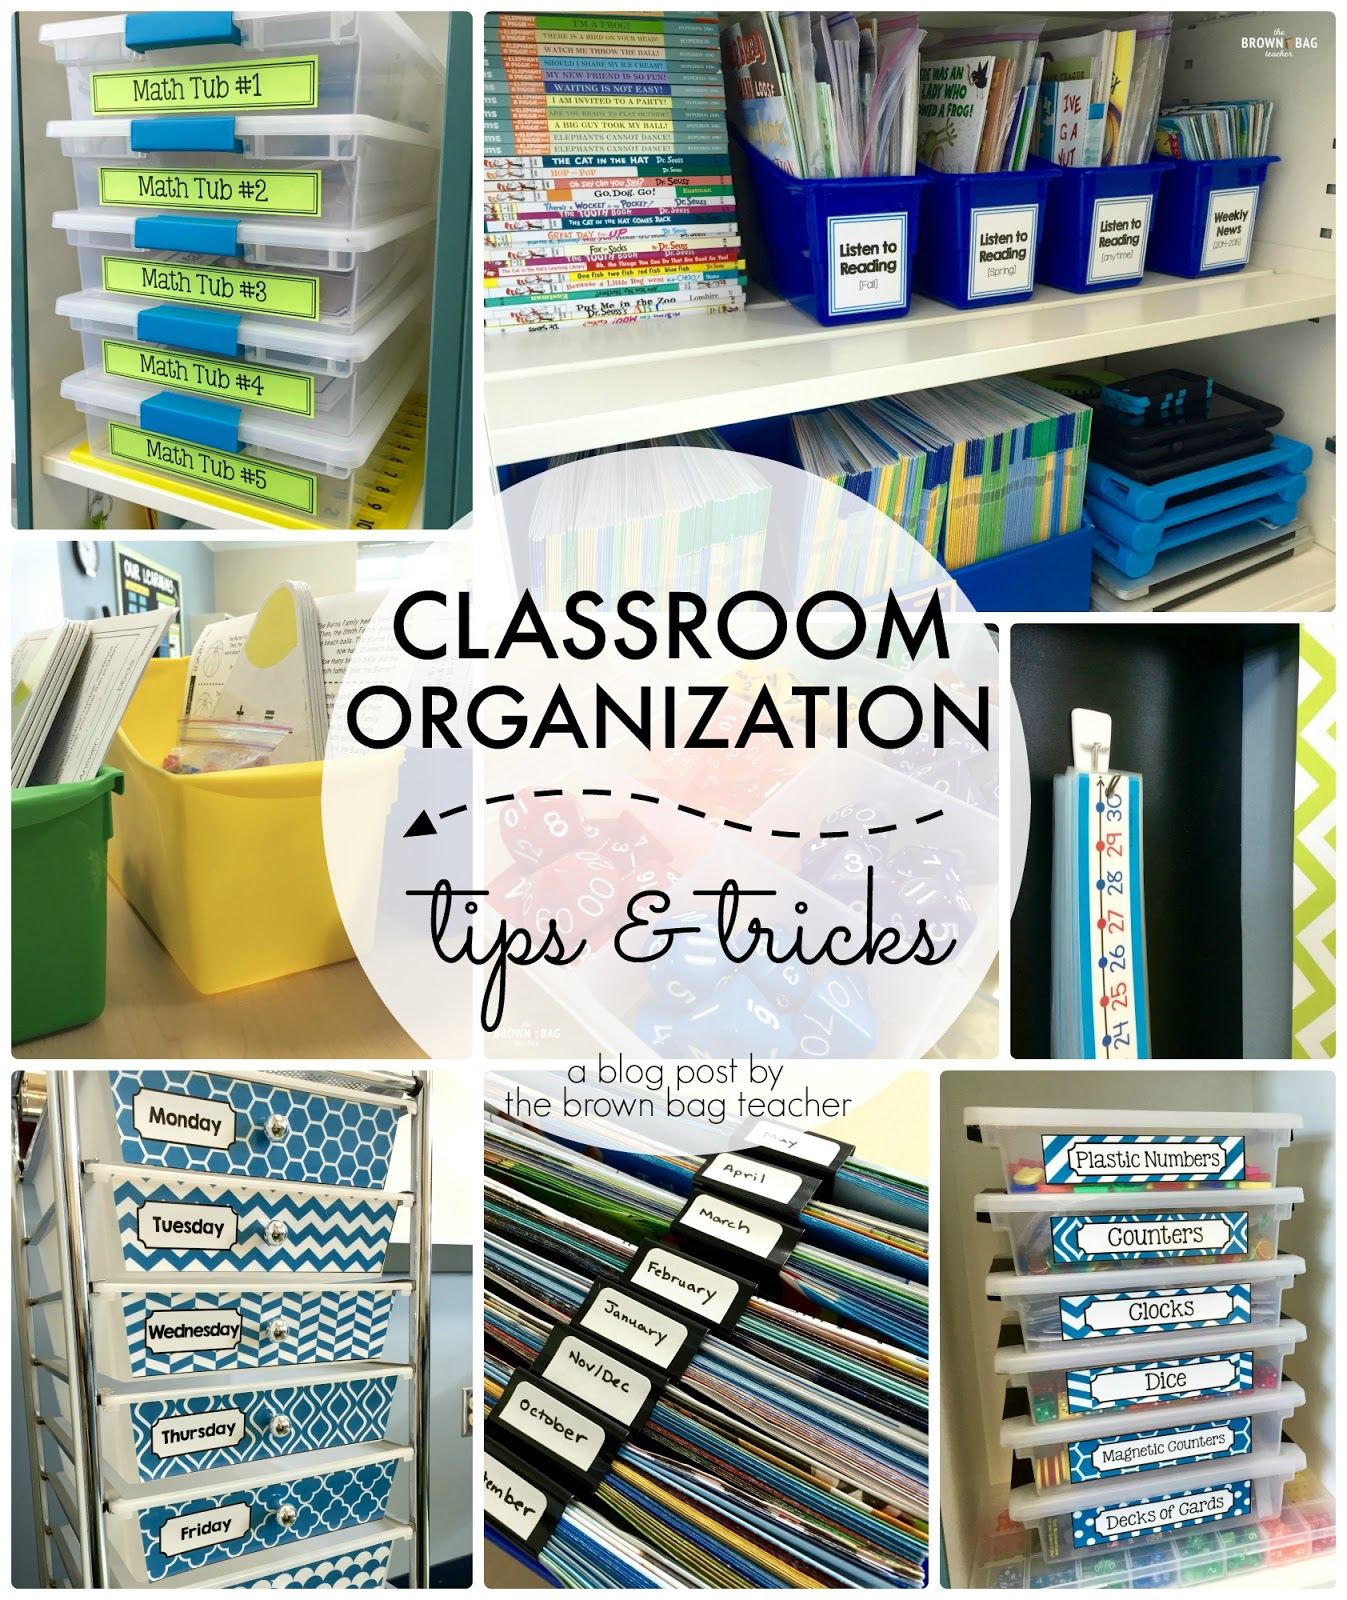 Classroom Organization: Tips and Tricks - The Brown Bag Teacher